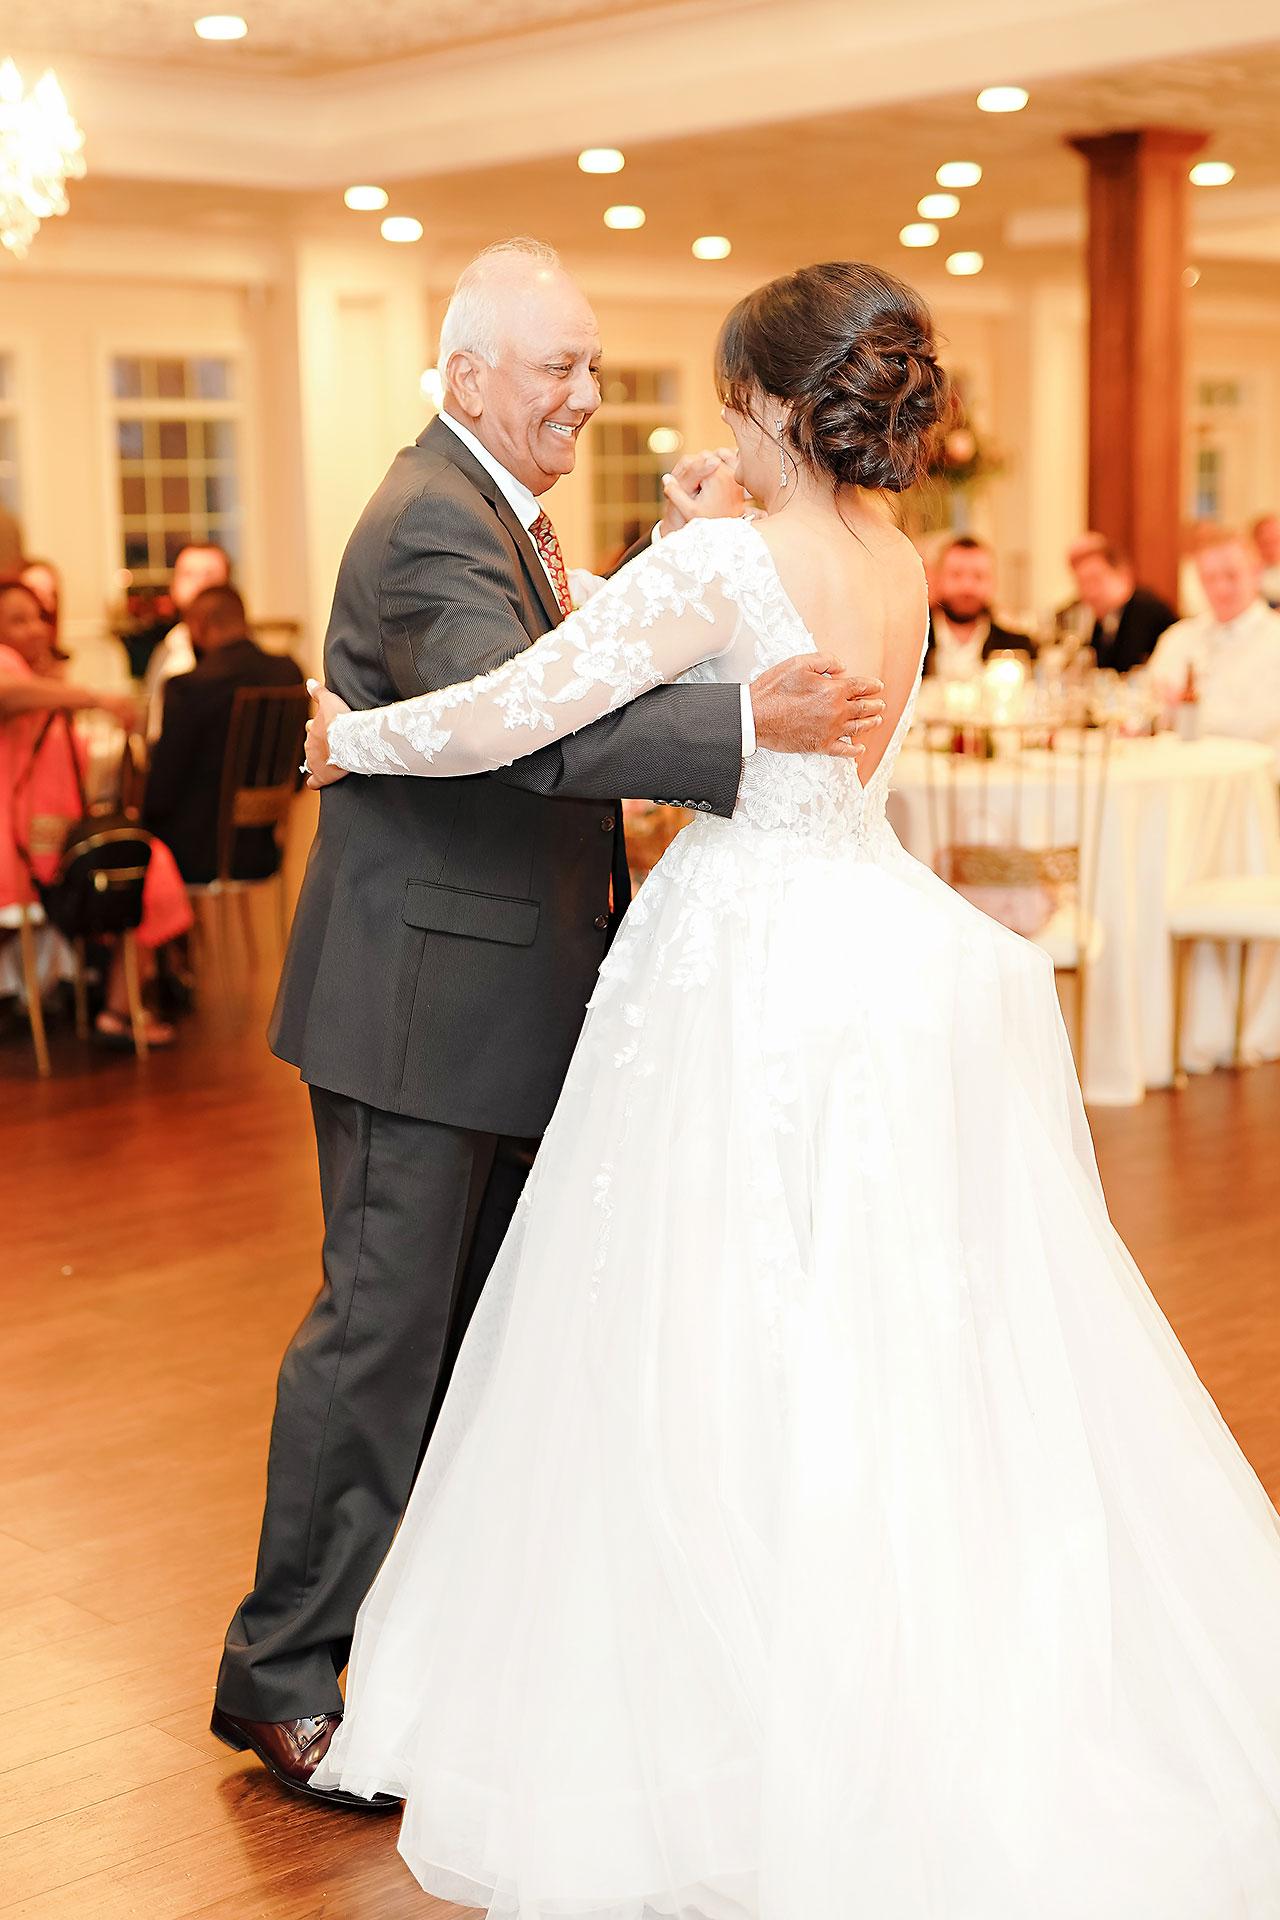 Nadia Parker Black Iris Estate Carmel Indiana Wedding May 2021 299